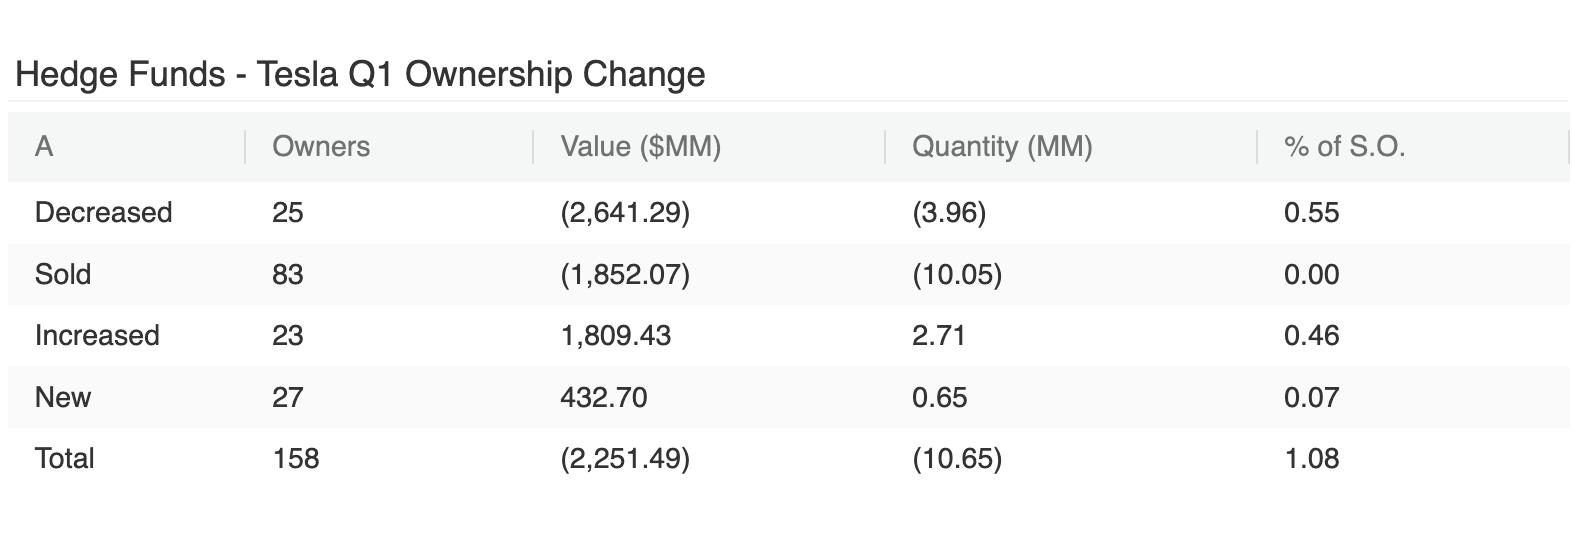 Hedge Funds Tesla Q1 Ownership Change